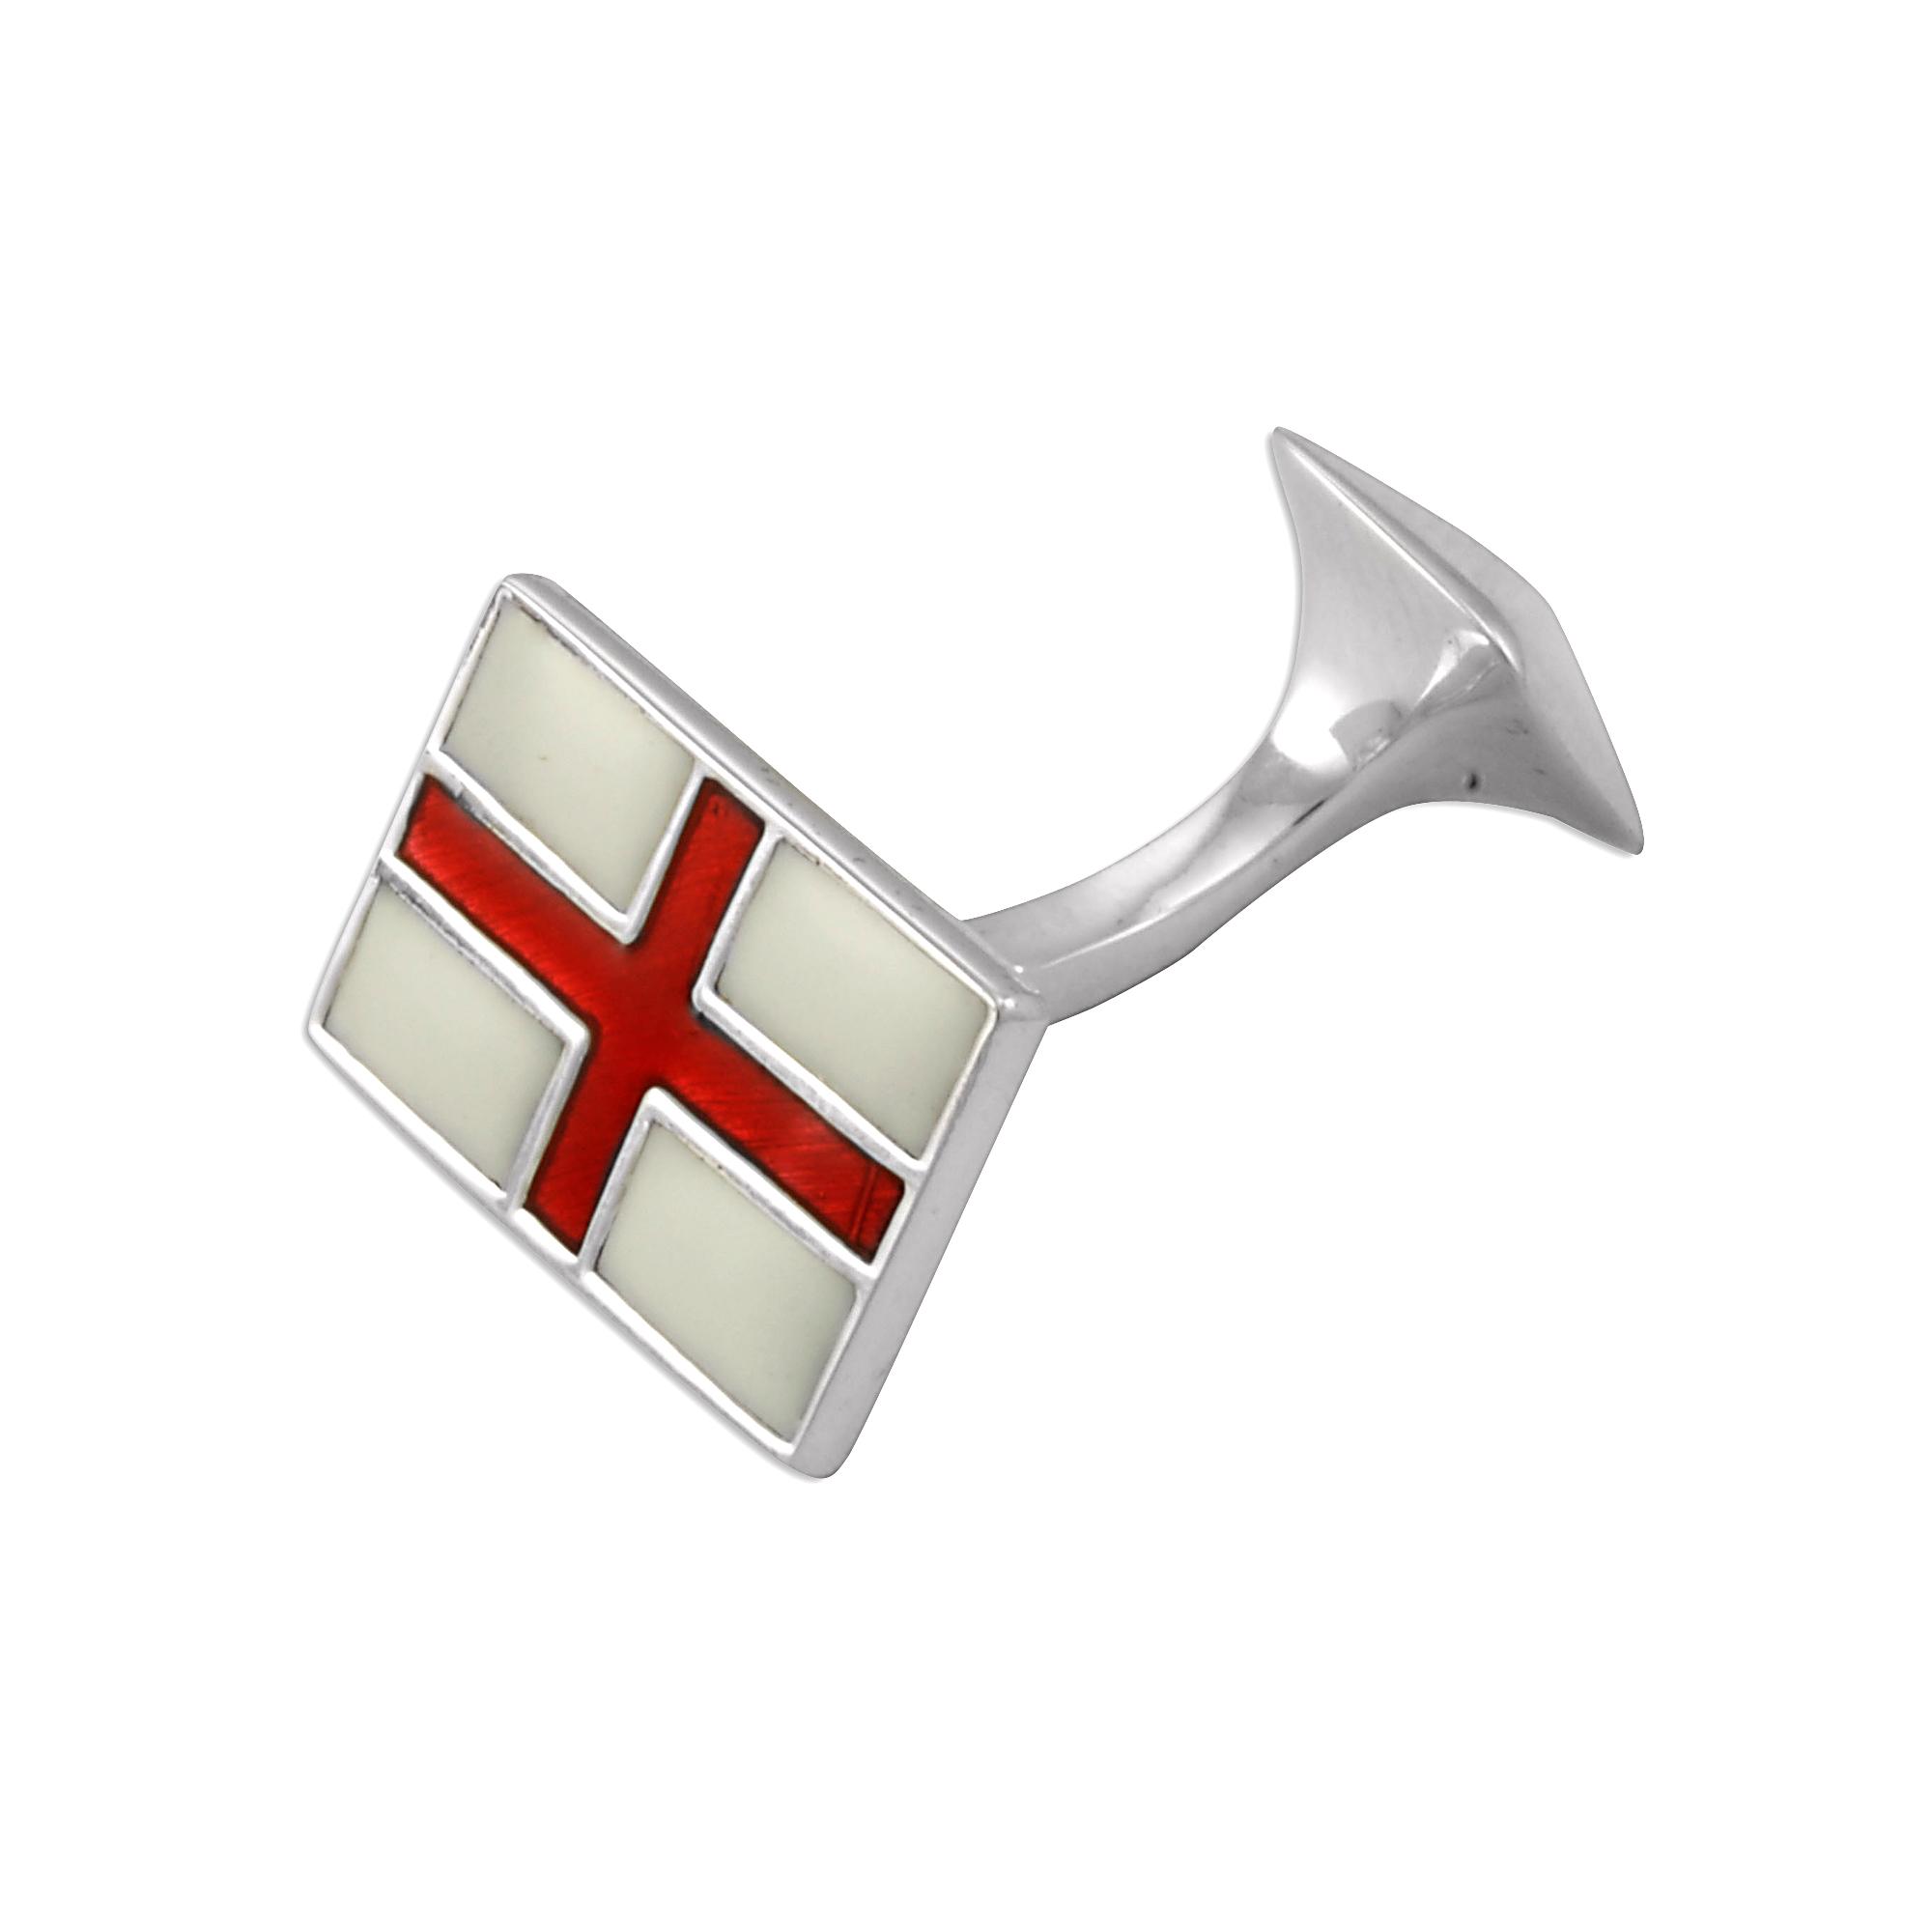 An image of Sterling Silver Enamel St. George Flag Cufflinks